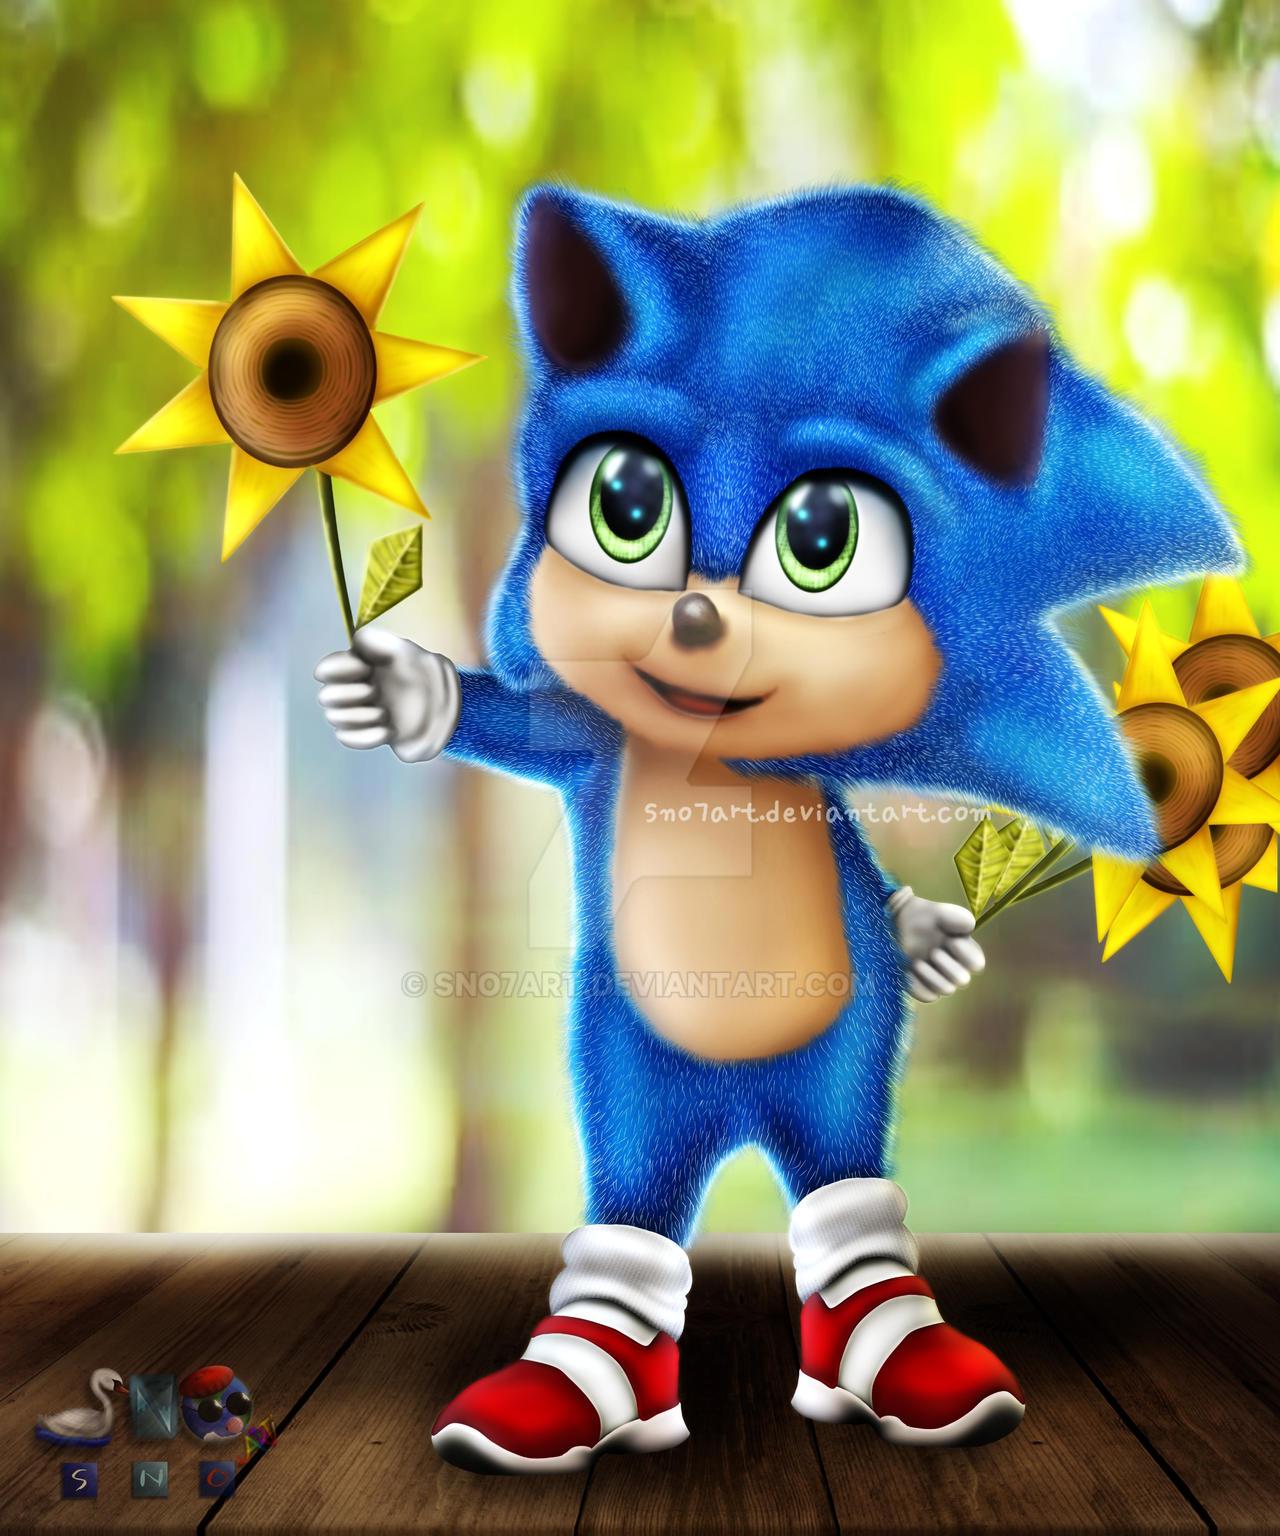 Baby Sonic 2020 By Sno7art On Deviantart